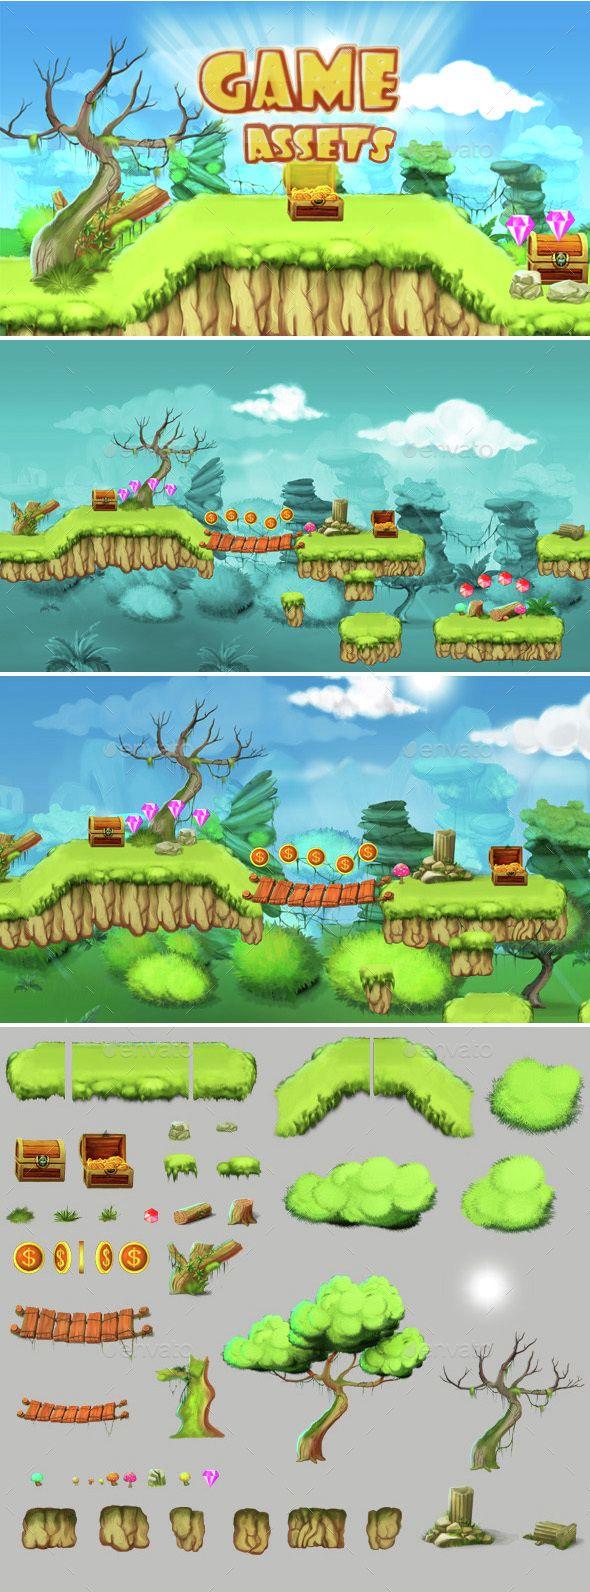 2D Tileset Platform Game — Photoshop PSD #sprite #assets • Available here → https://graphicriver.net/item/2d-tileset-platform-game-/14544412?ref=pxcr